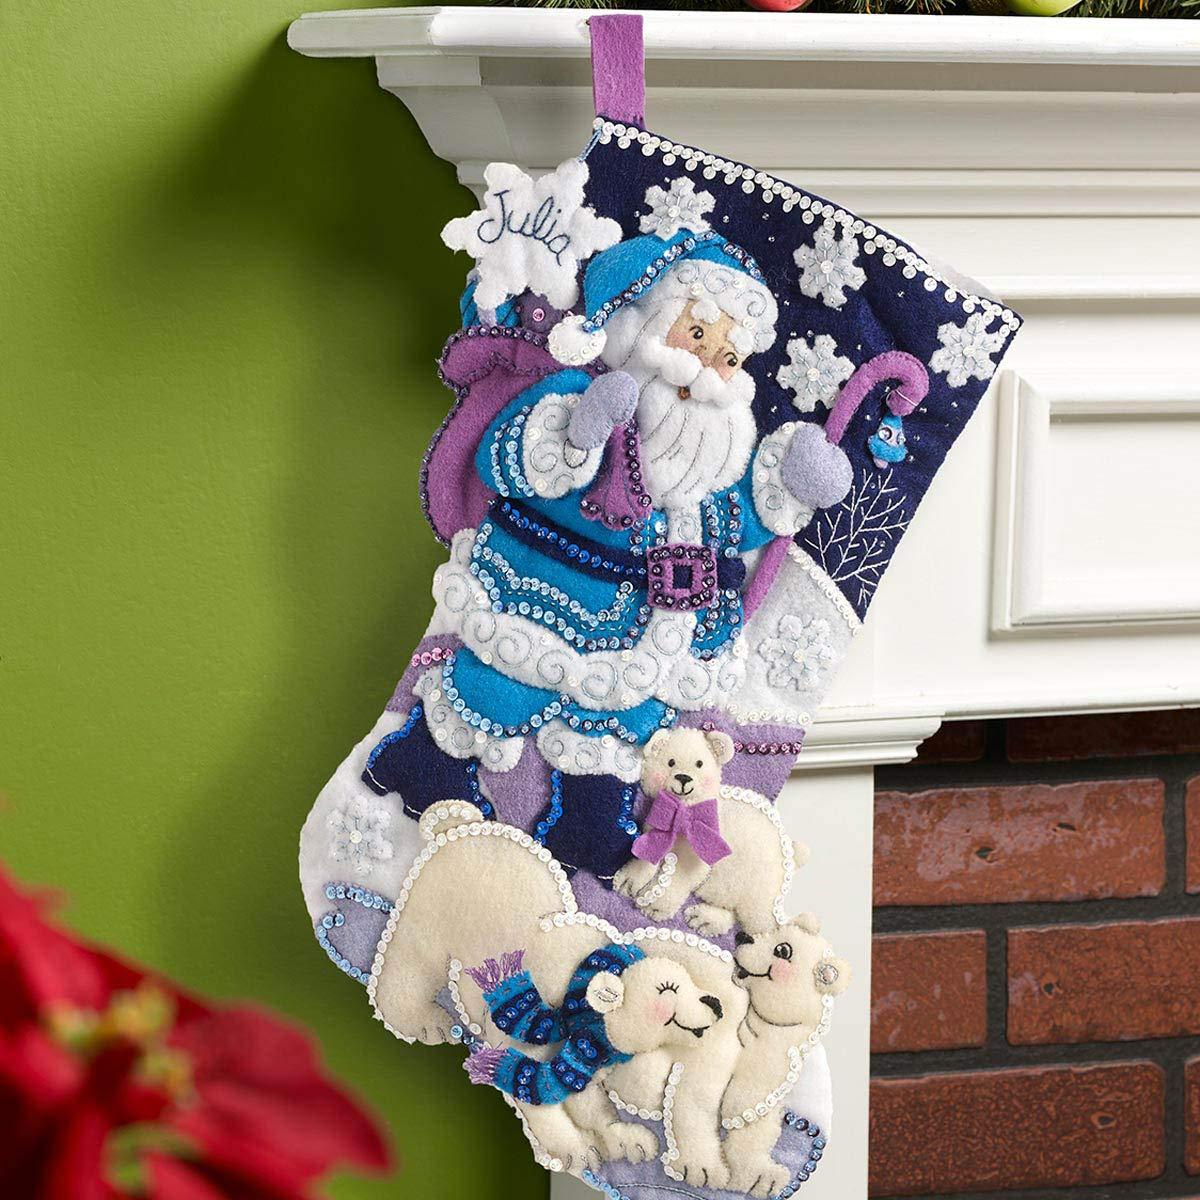 86653 Arctic Santa Bucilla 18-Inch Christmas Stocking Felt Applique Kit